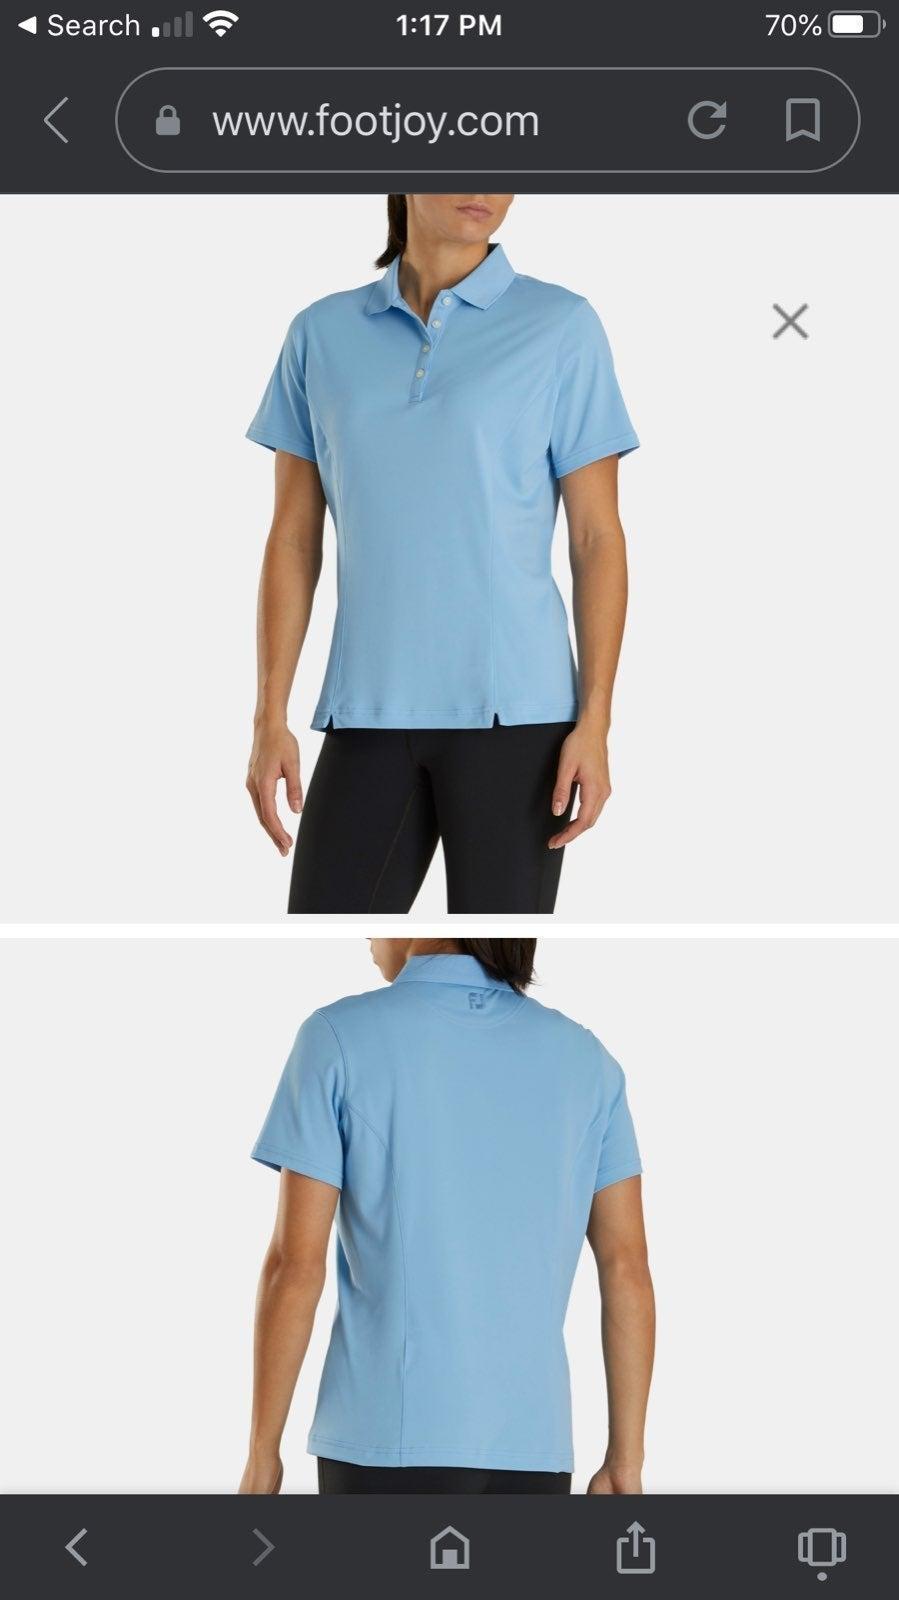 Footjoy Women's ProDry Interlock Shirt S